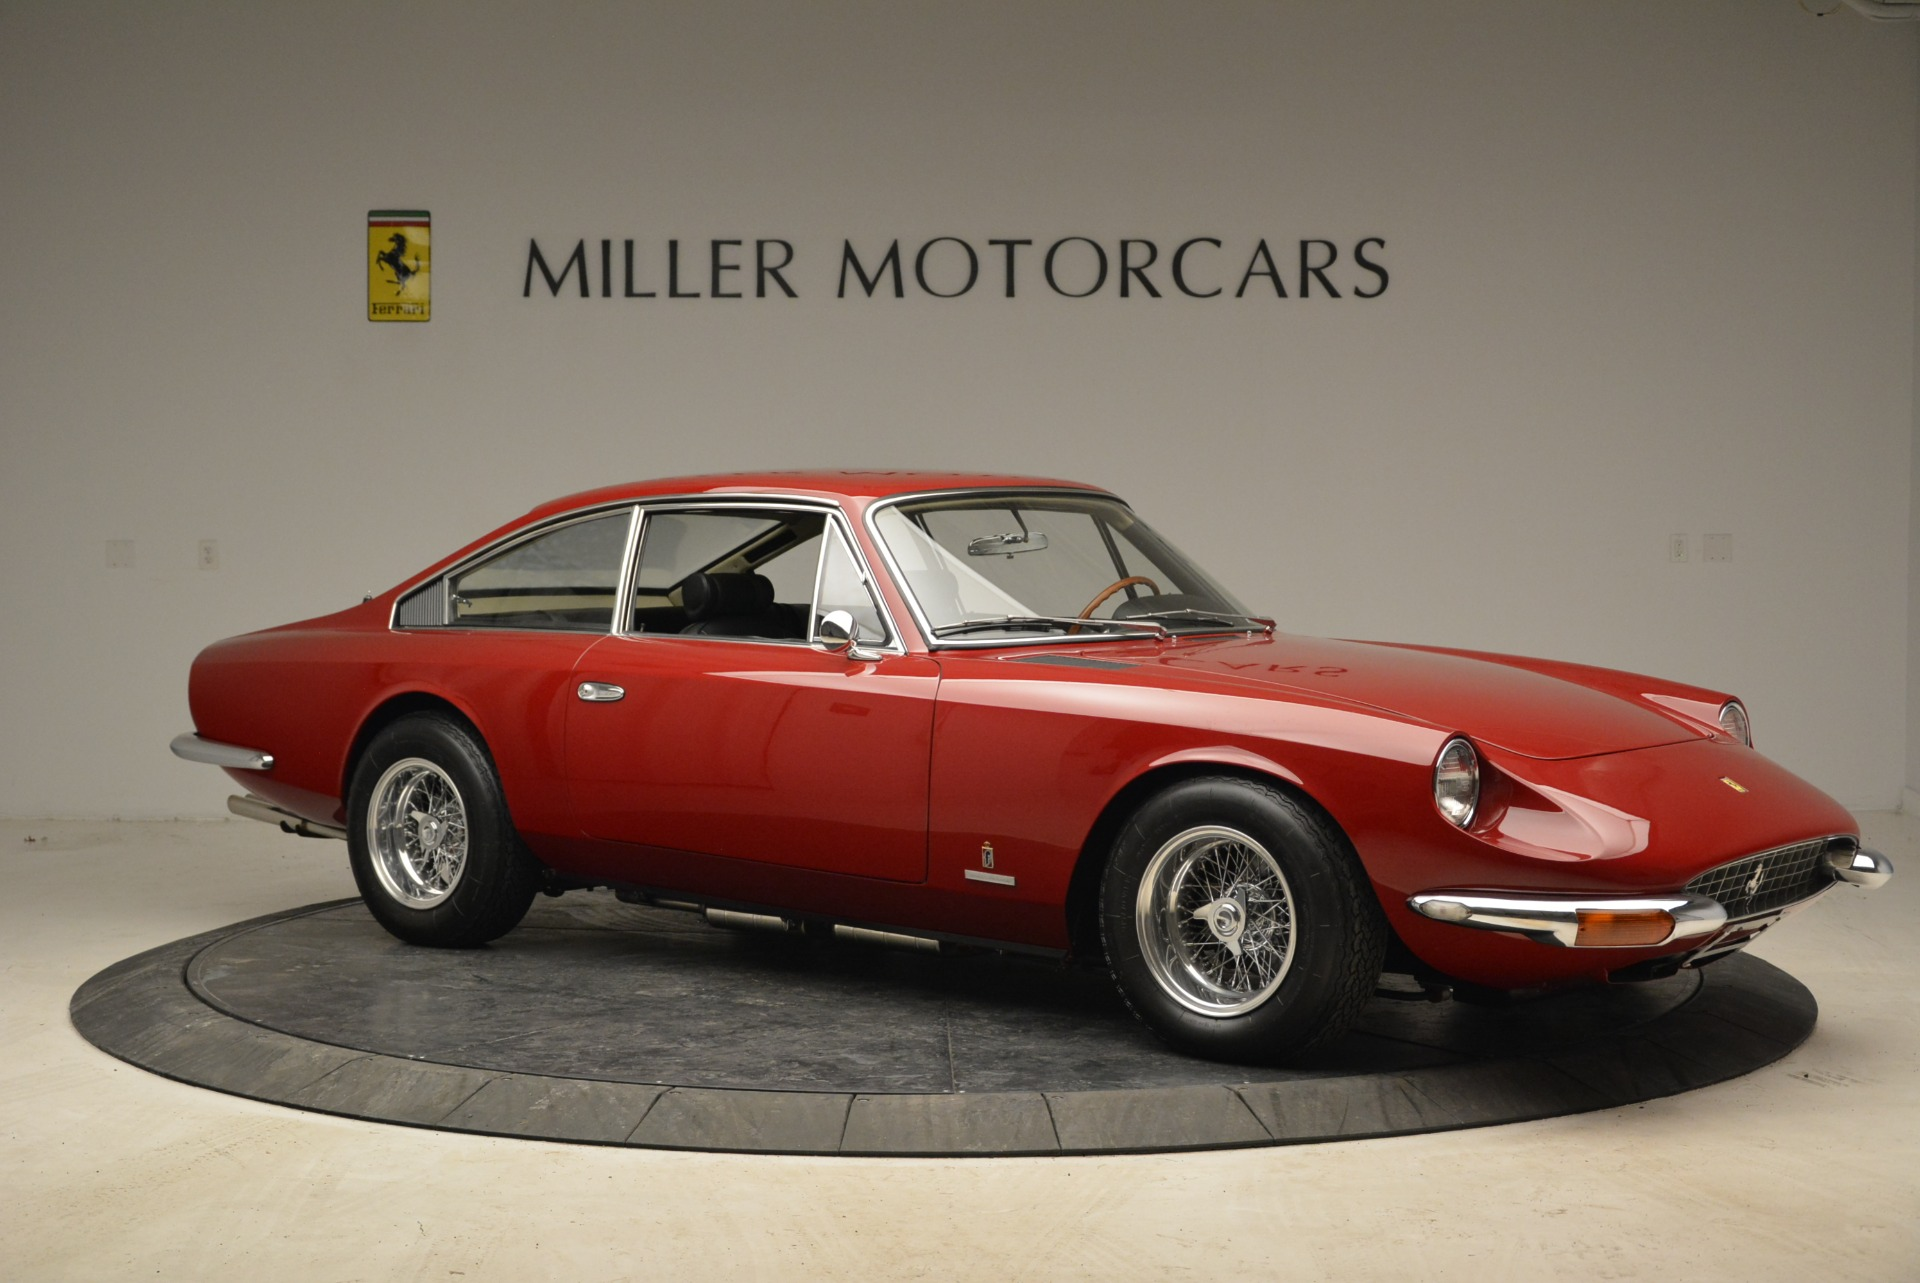 Used 1969 Ferrari 365 GT 2+2  For Sale In Greenwich, CT. Alfa Romeo of Greenwich, 4424 1995_p10